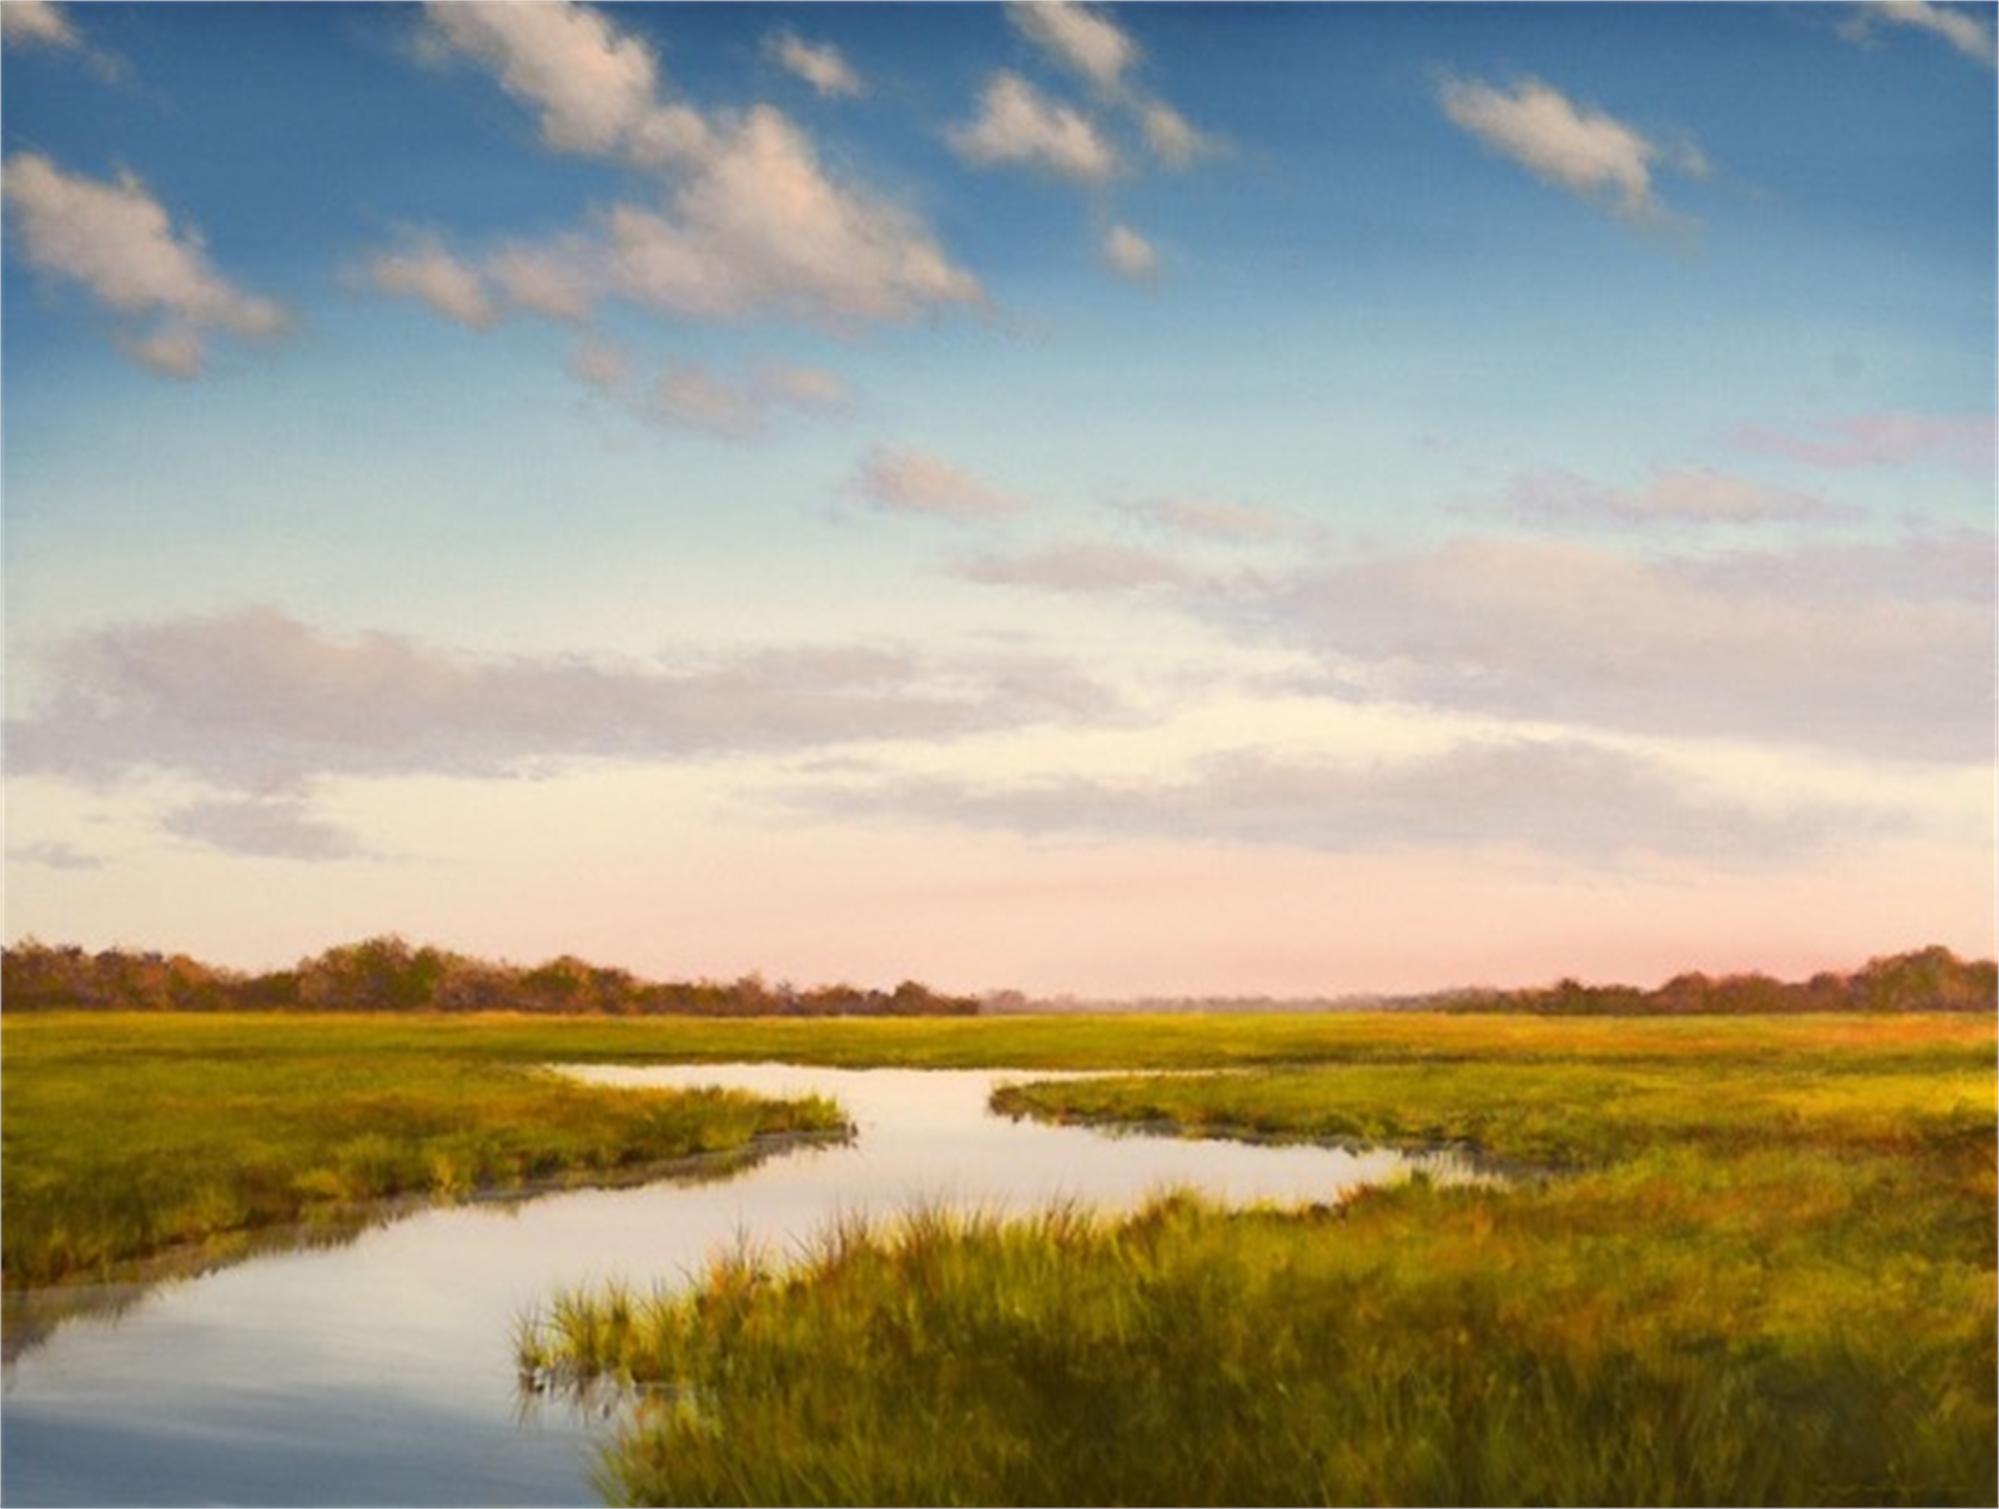 Lowland Duck by David Nance